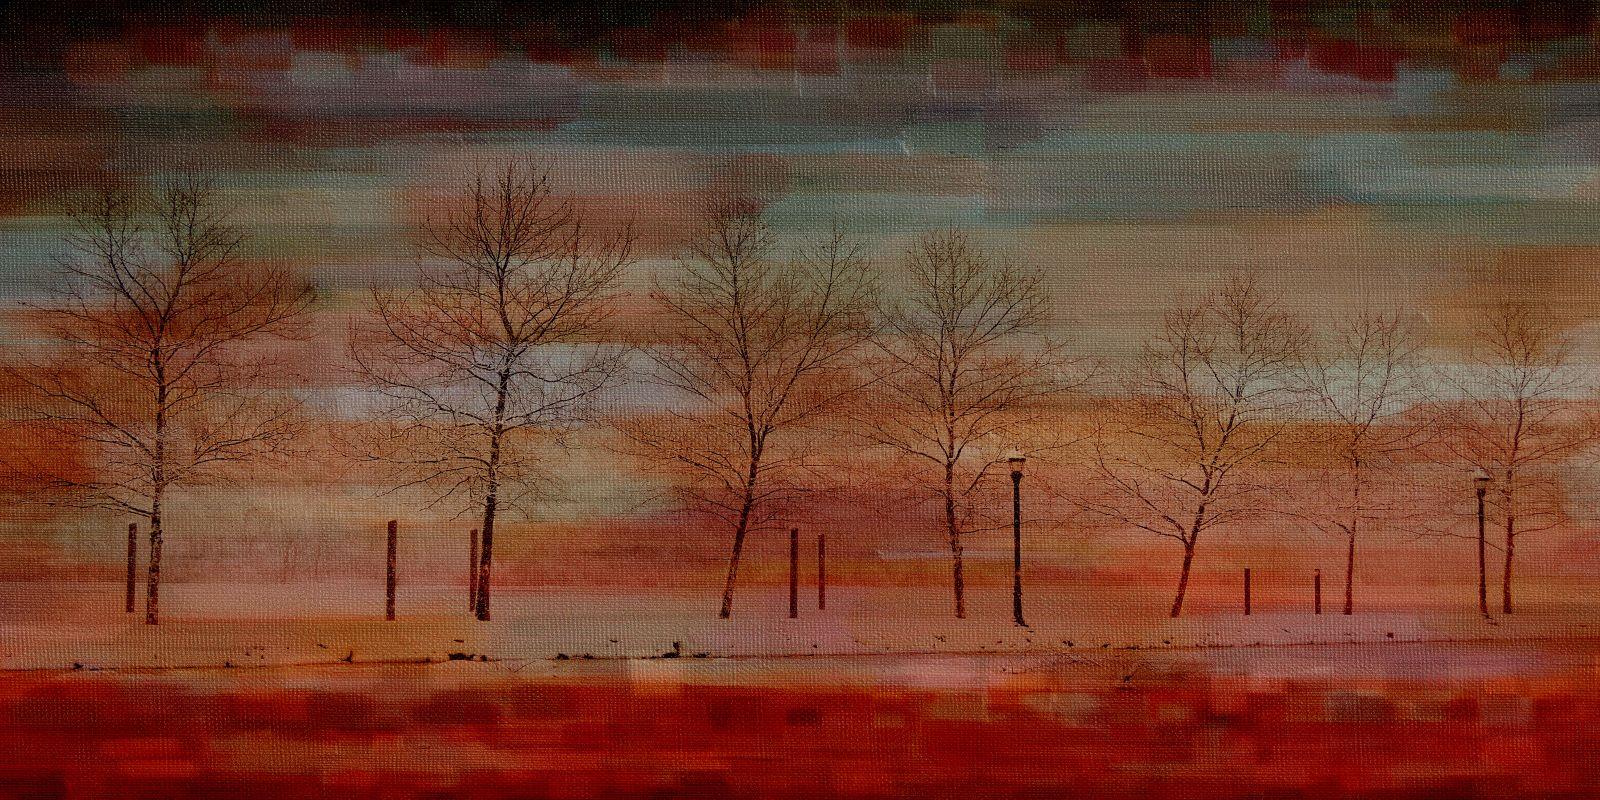 Parvez Taj Deep Red View Art Print on Premium Canvas 22 1/2 x 45 Home Sale $161.03 ITEM: bci2685783 ID#:PTNOV-140-C-45 UPC: 708191043614 :